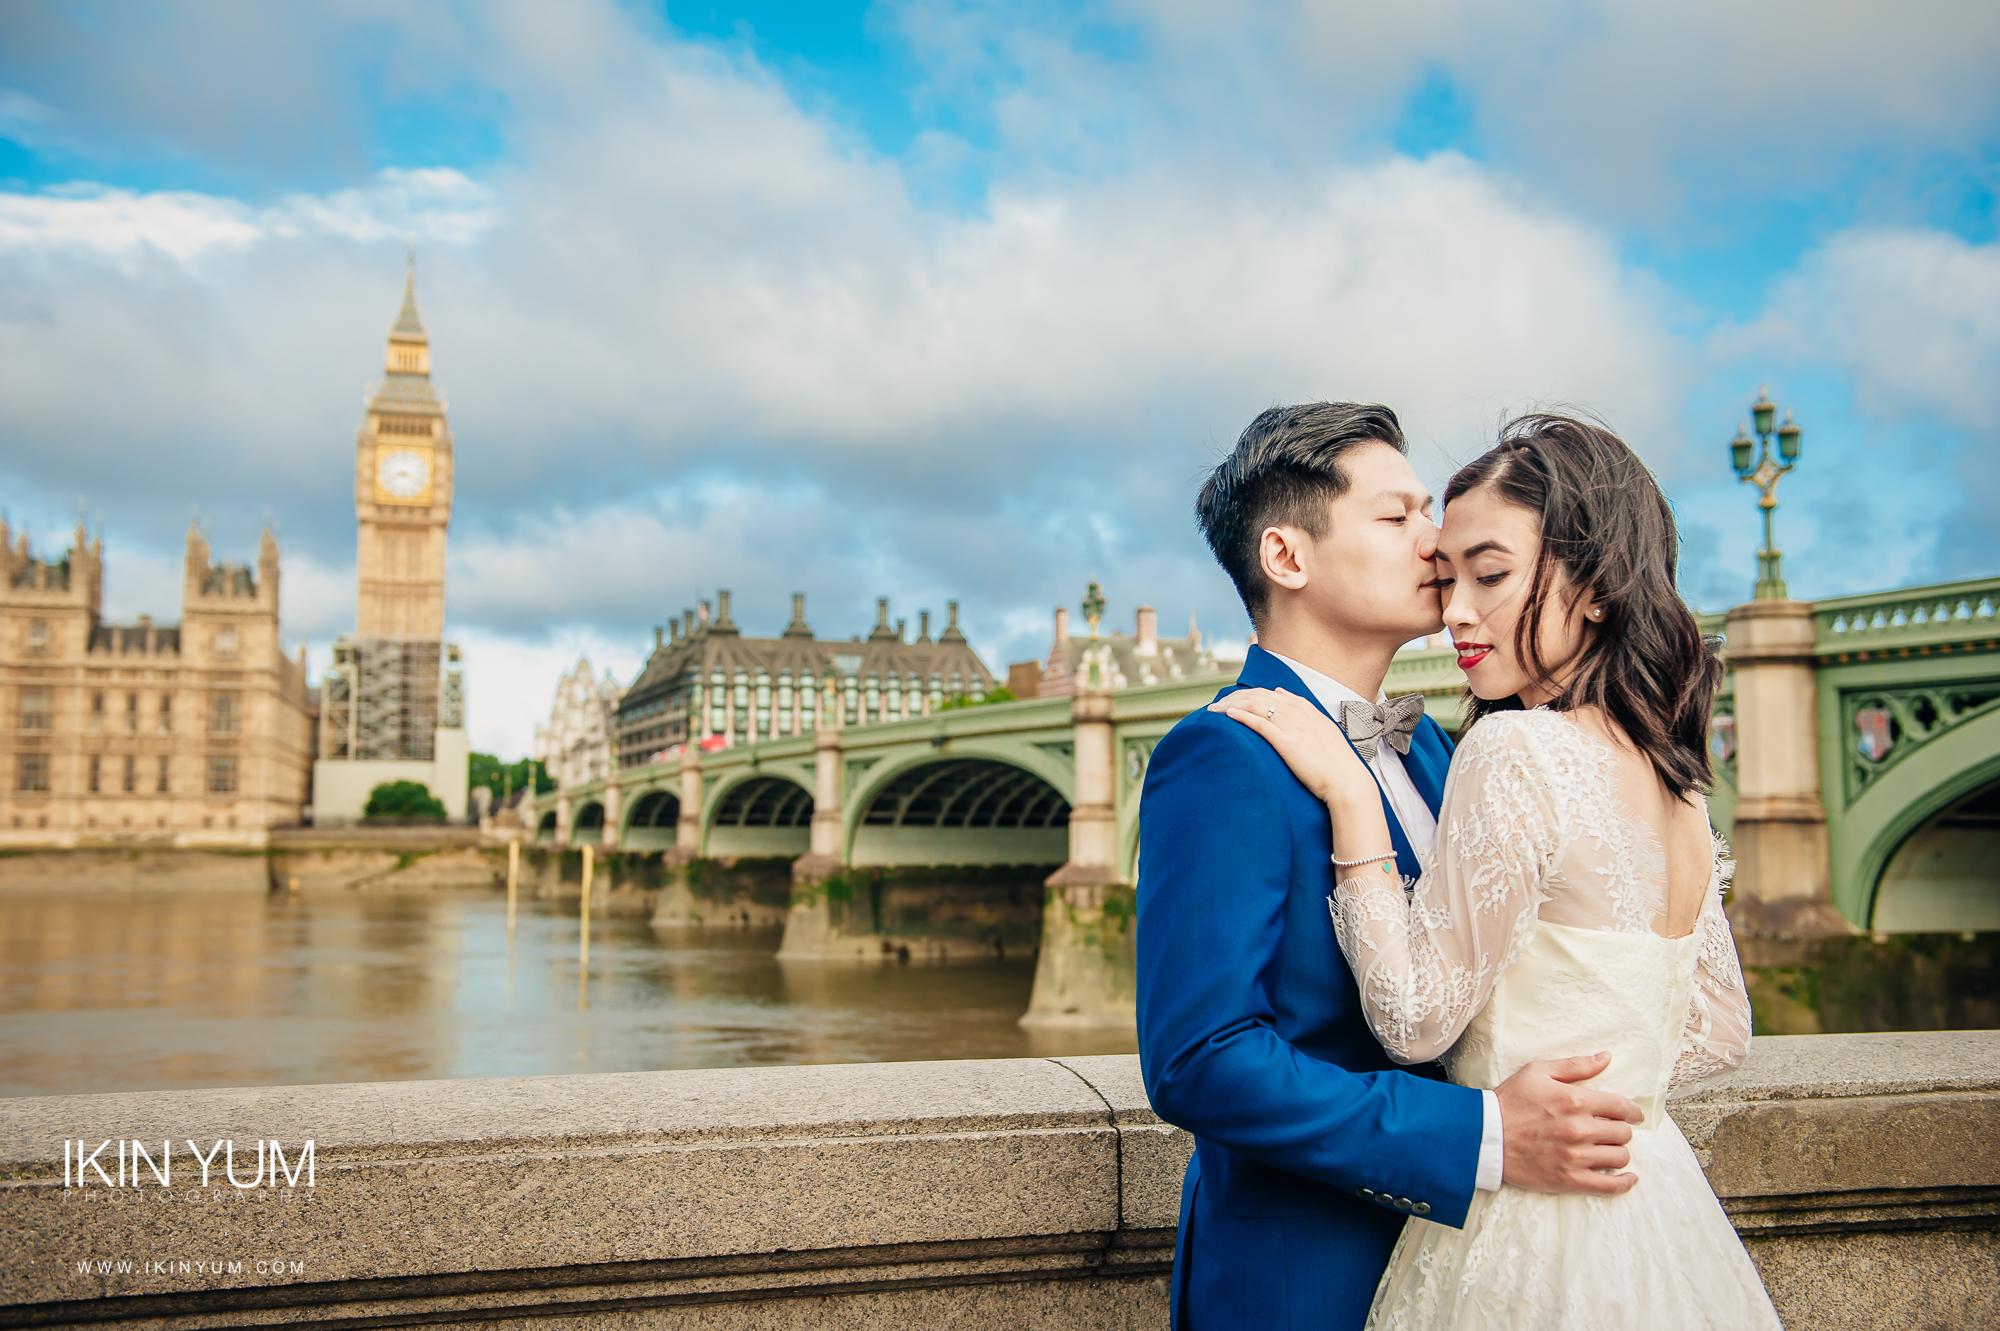 Natalie & Duncan Wedding Day - Ikin Yum Photography-019.jpg